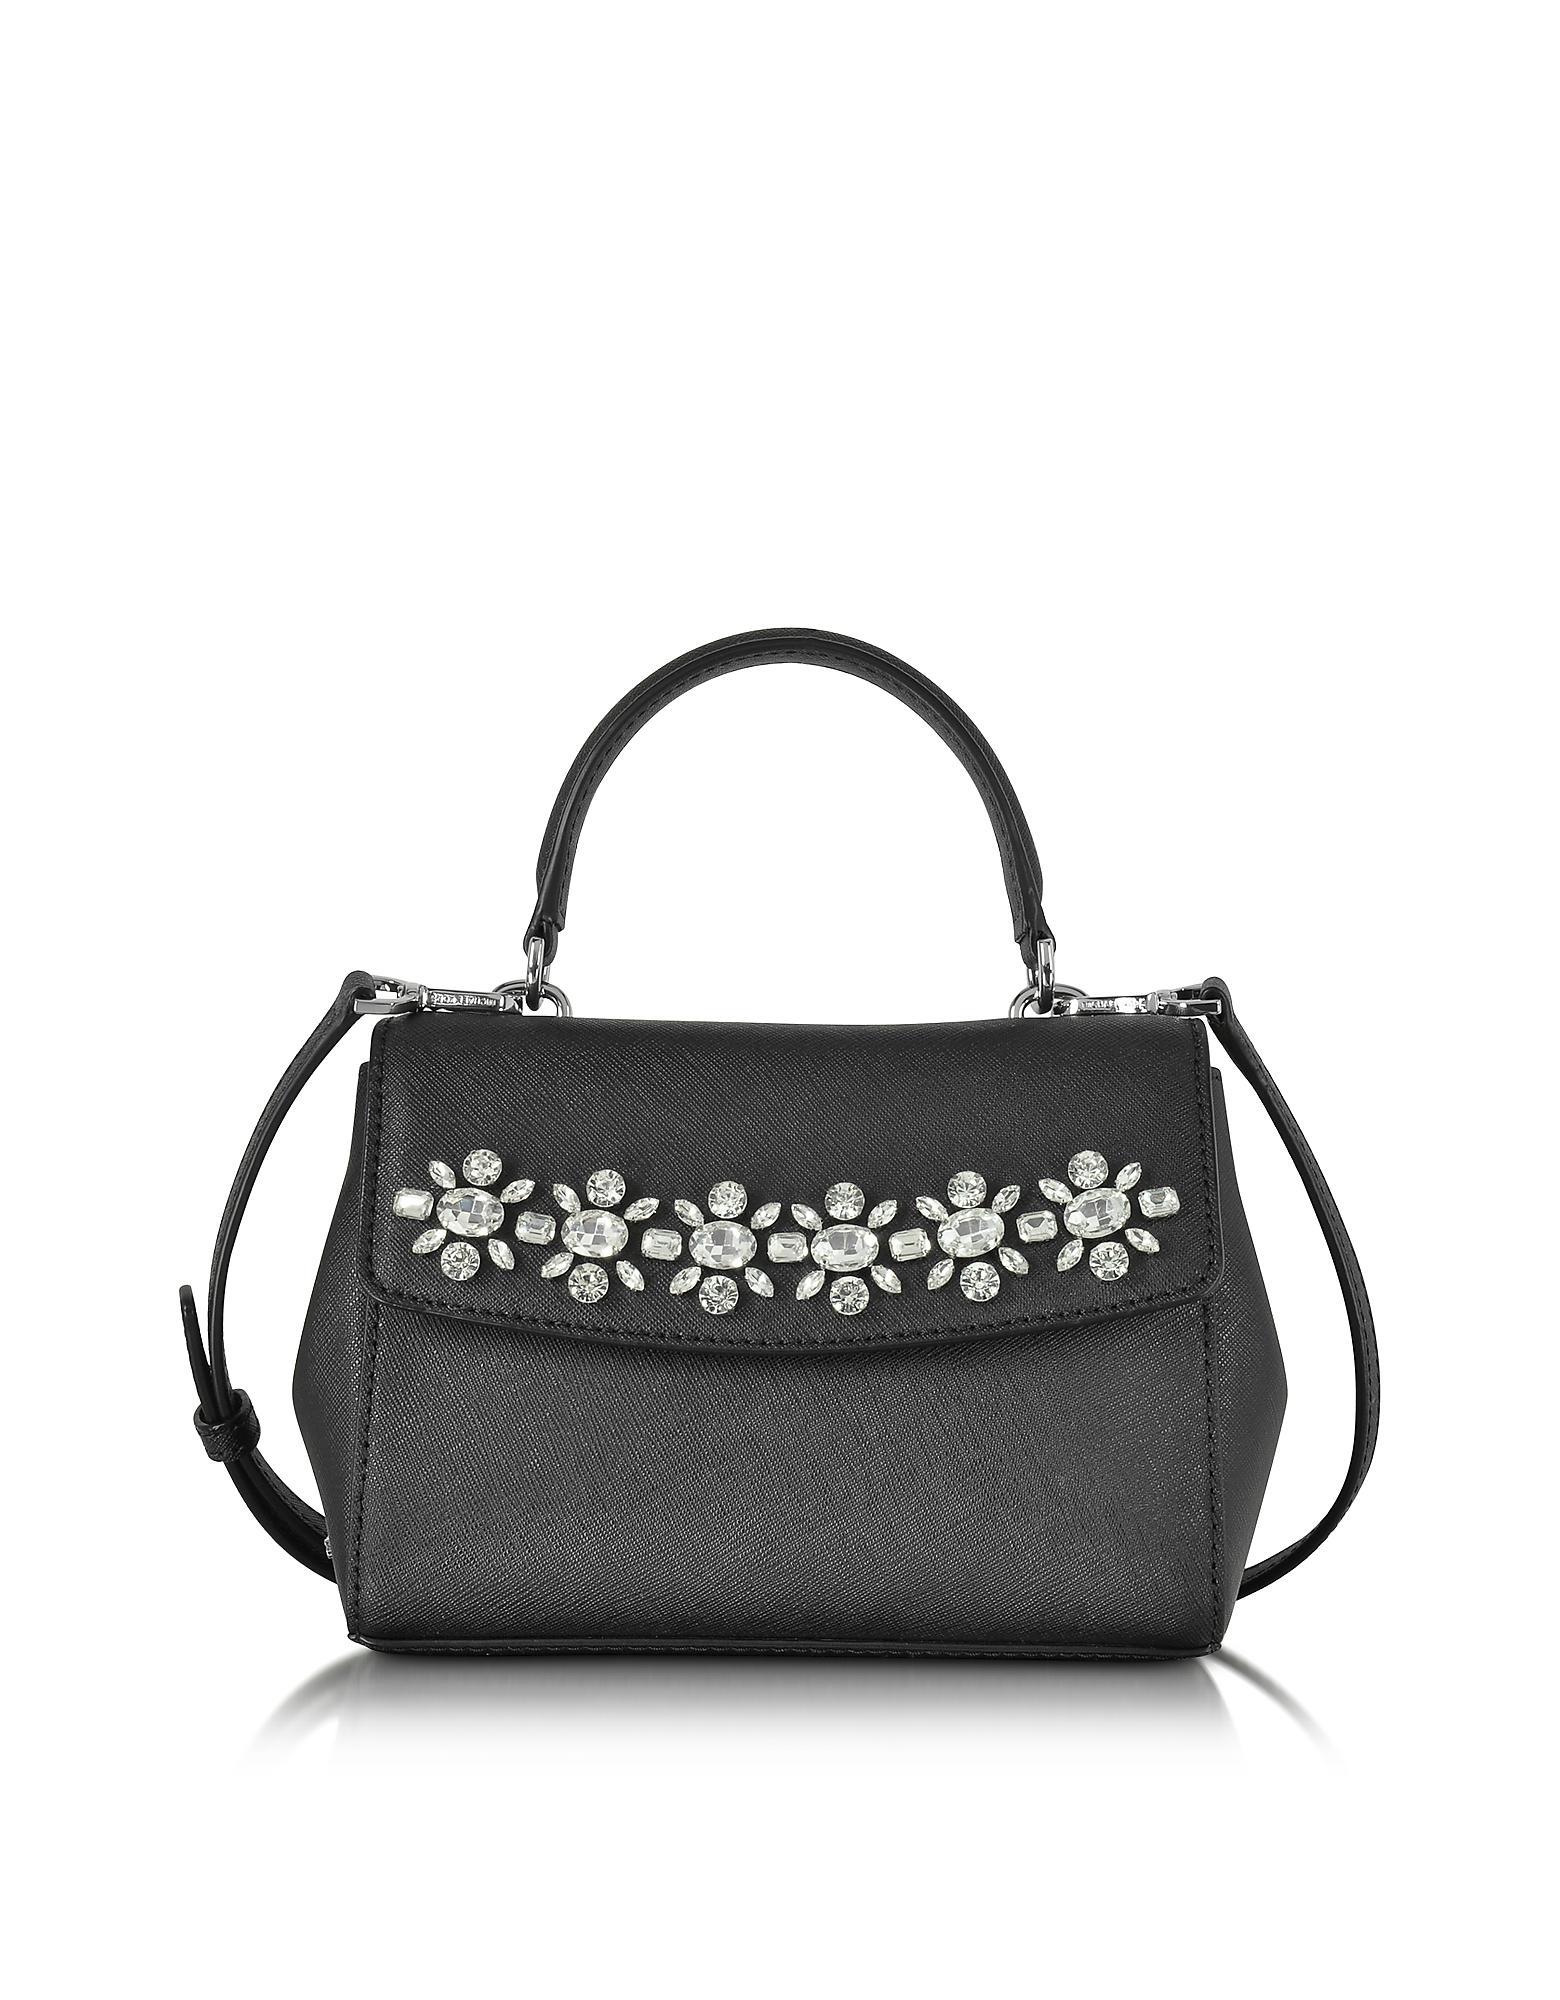 1532629a157a Lyst - Michael Kors Ava Jewelry XS Saffiano Leather Cross-Body Bag ...